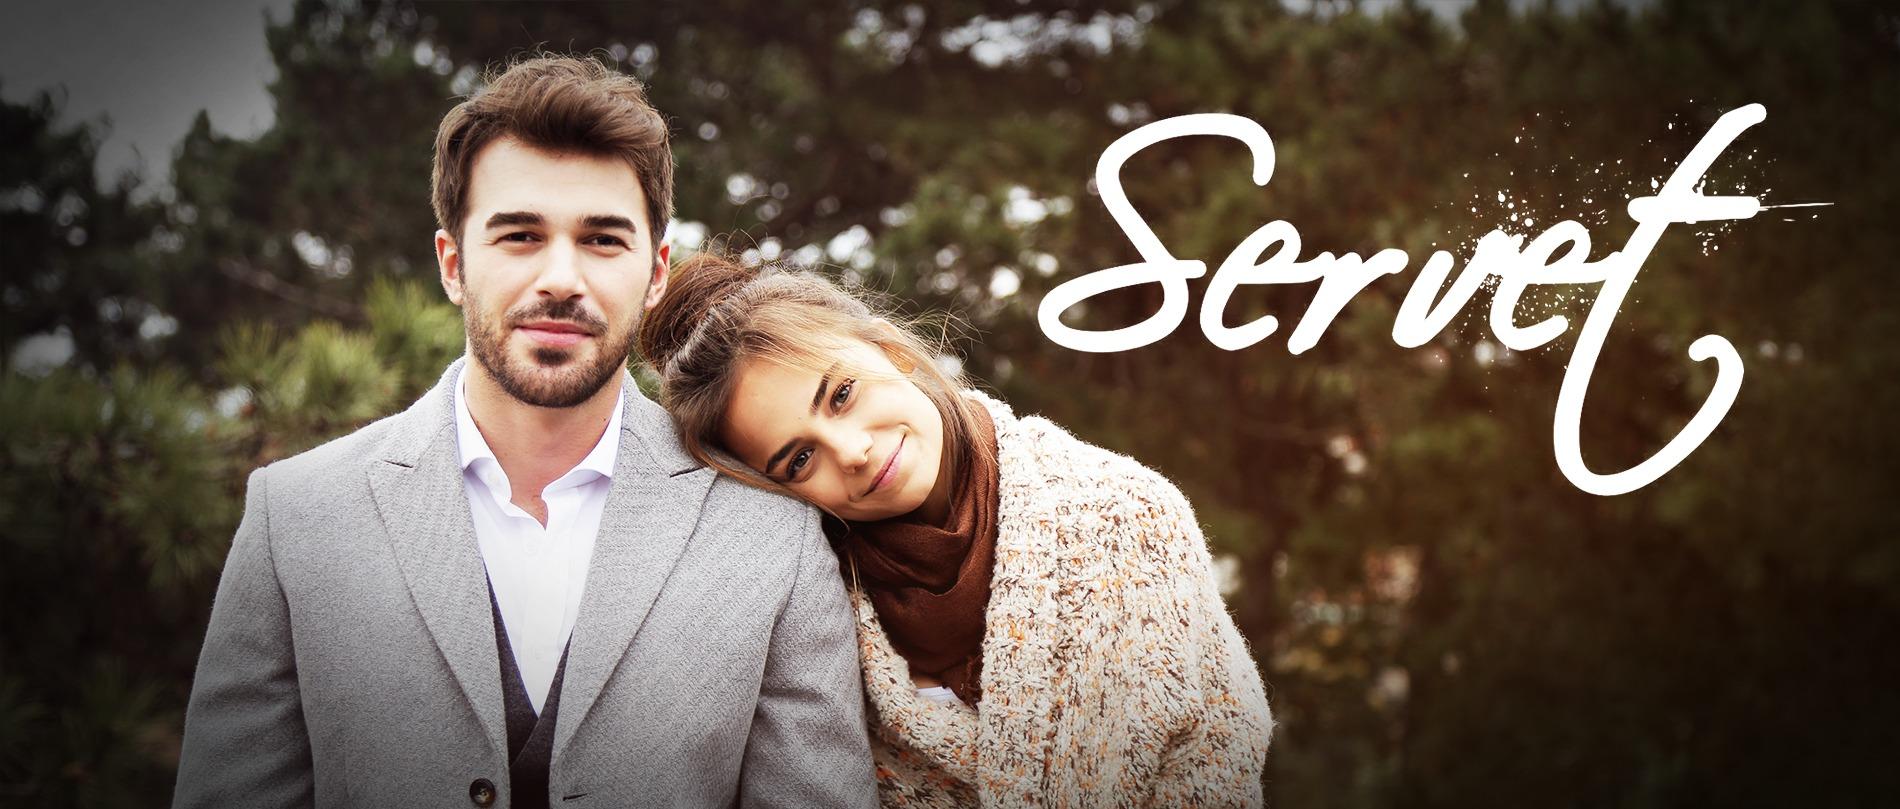 دانلود سریال ثروت Servet-لینک مستقیم و رایگان